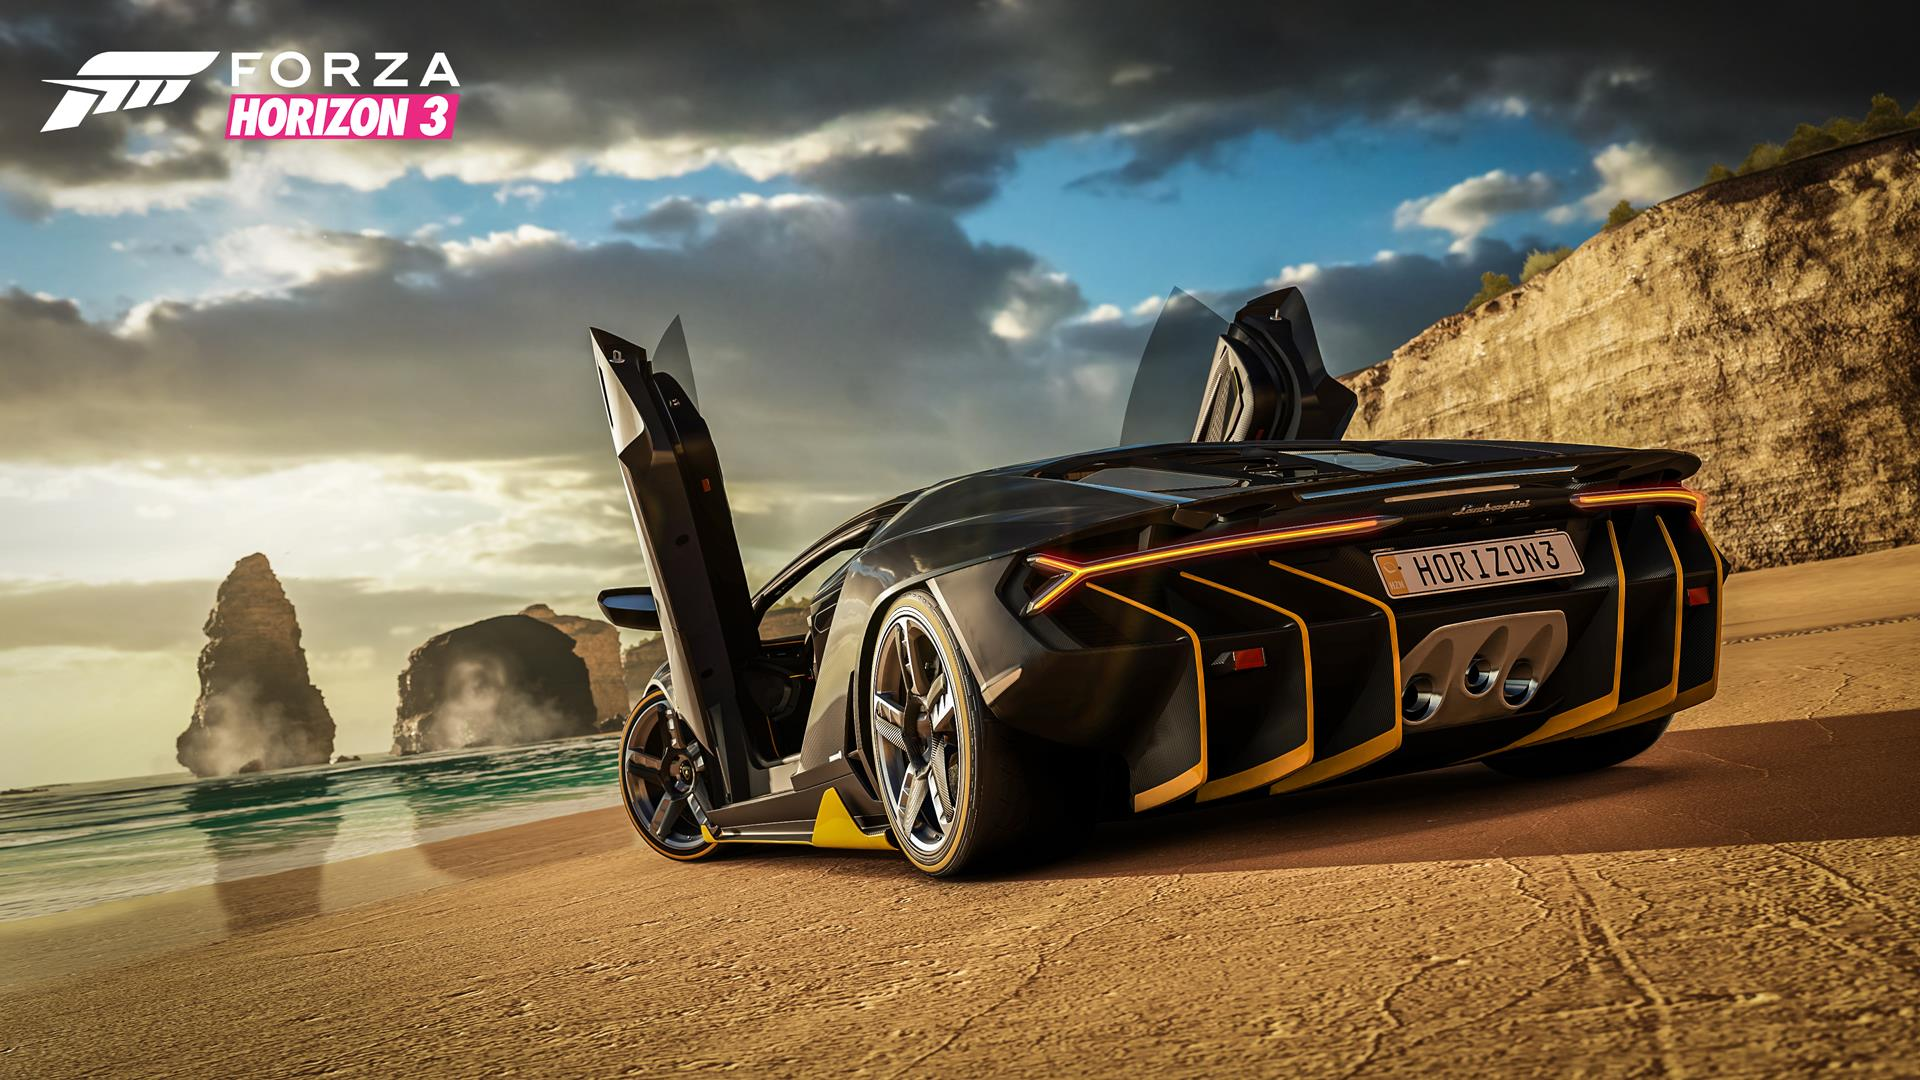 forza_horizon_3_gameplay_reveal_e3_screen_9 Elegant Lamborghini Huracan forza Horizon 2 Cars Trend